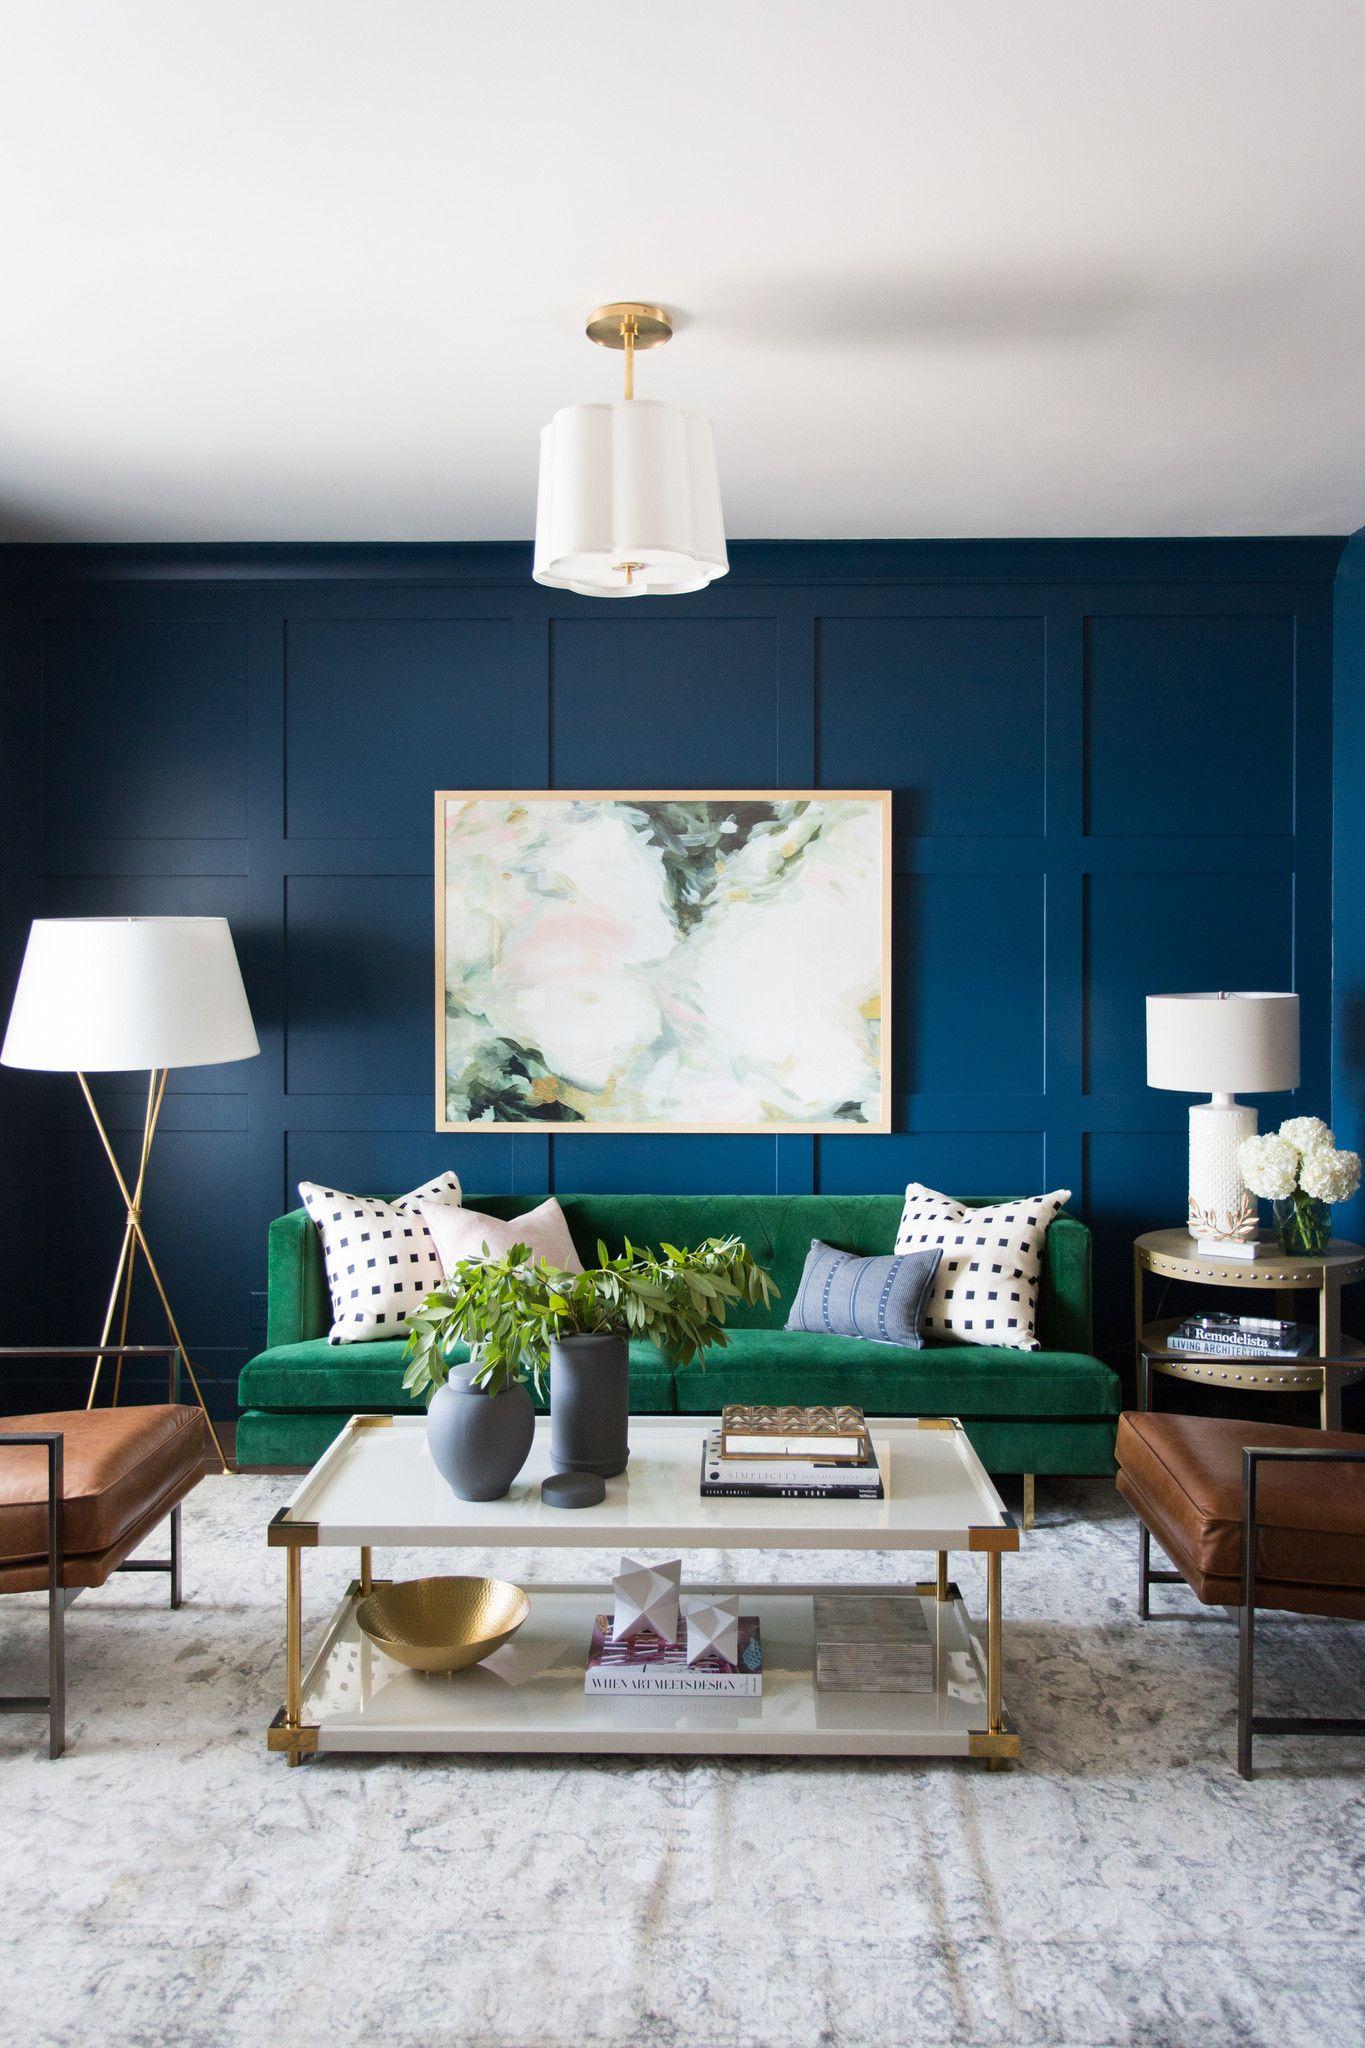 Scallop Chandelier Green Sofa Living Room Living Room Paint Paint Colors For Living Room